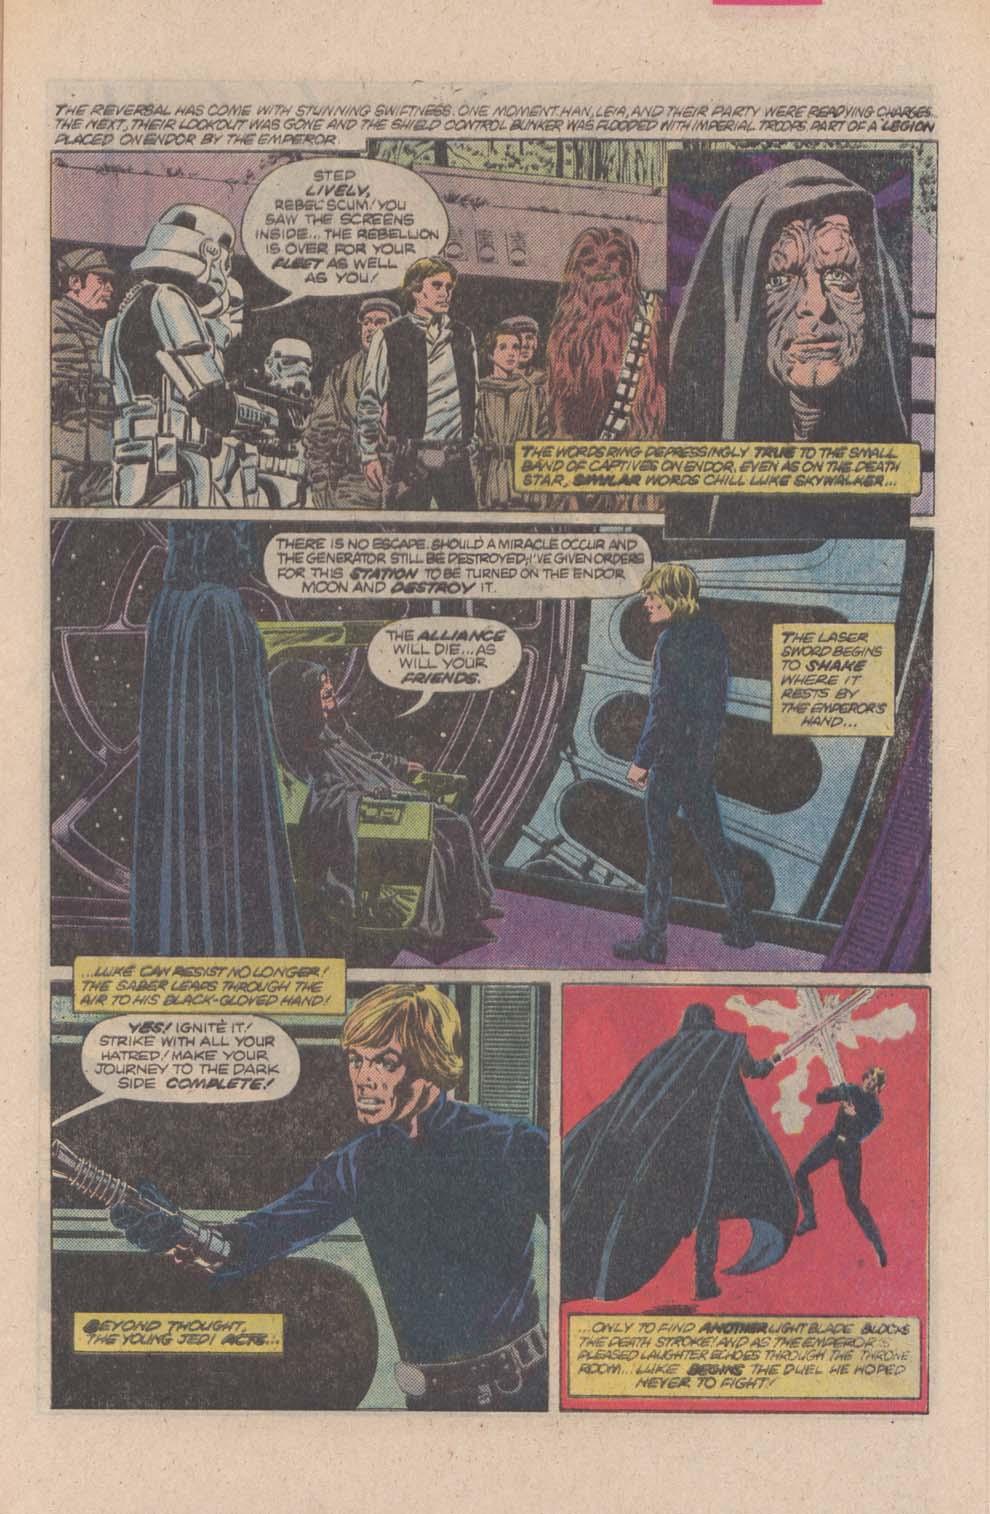 Read online Star Wars: Return of the Jedi comic -  Issue #4 - 8